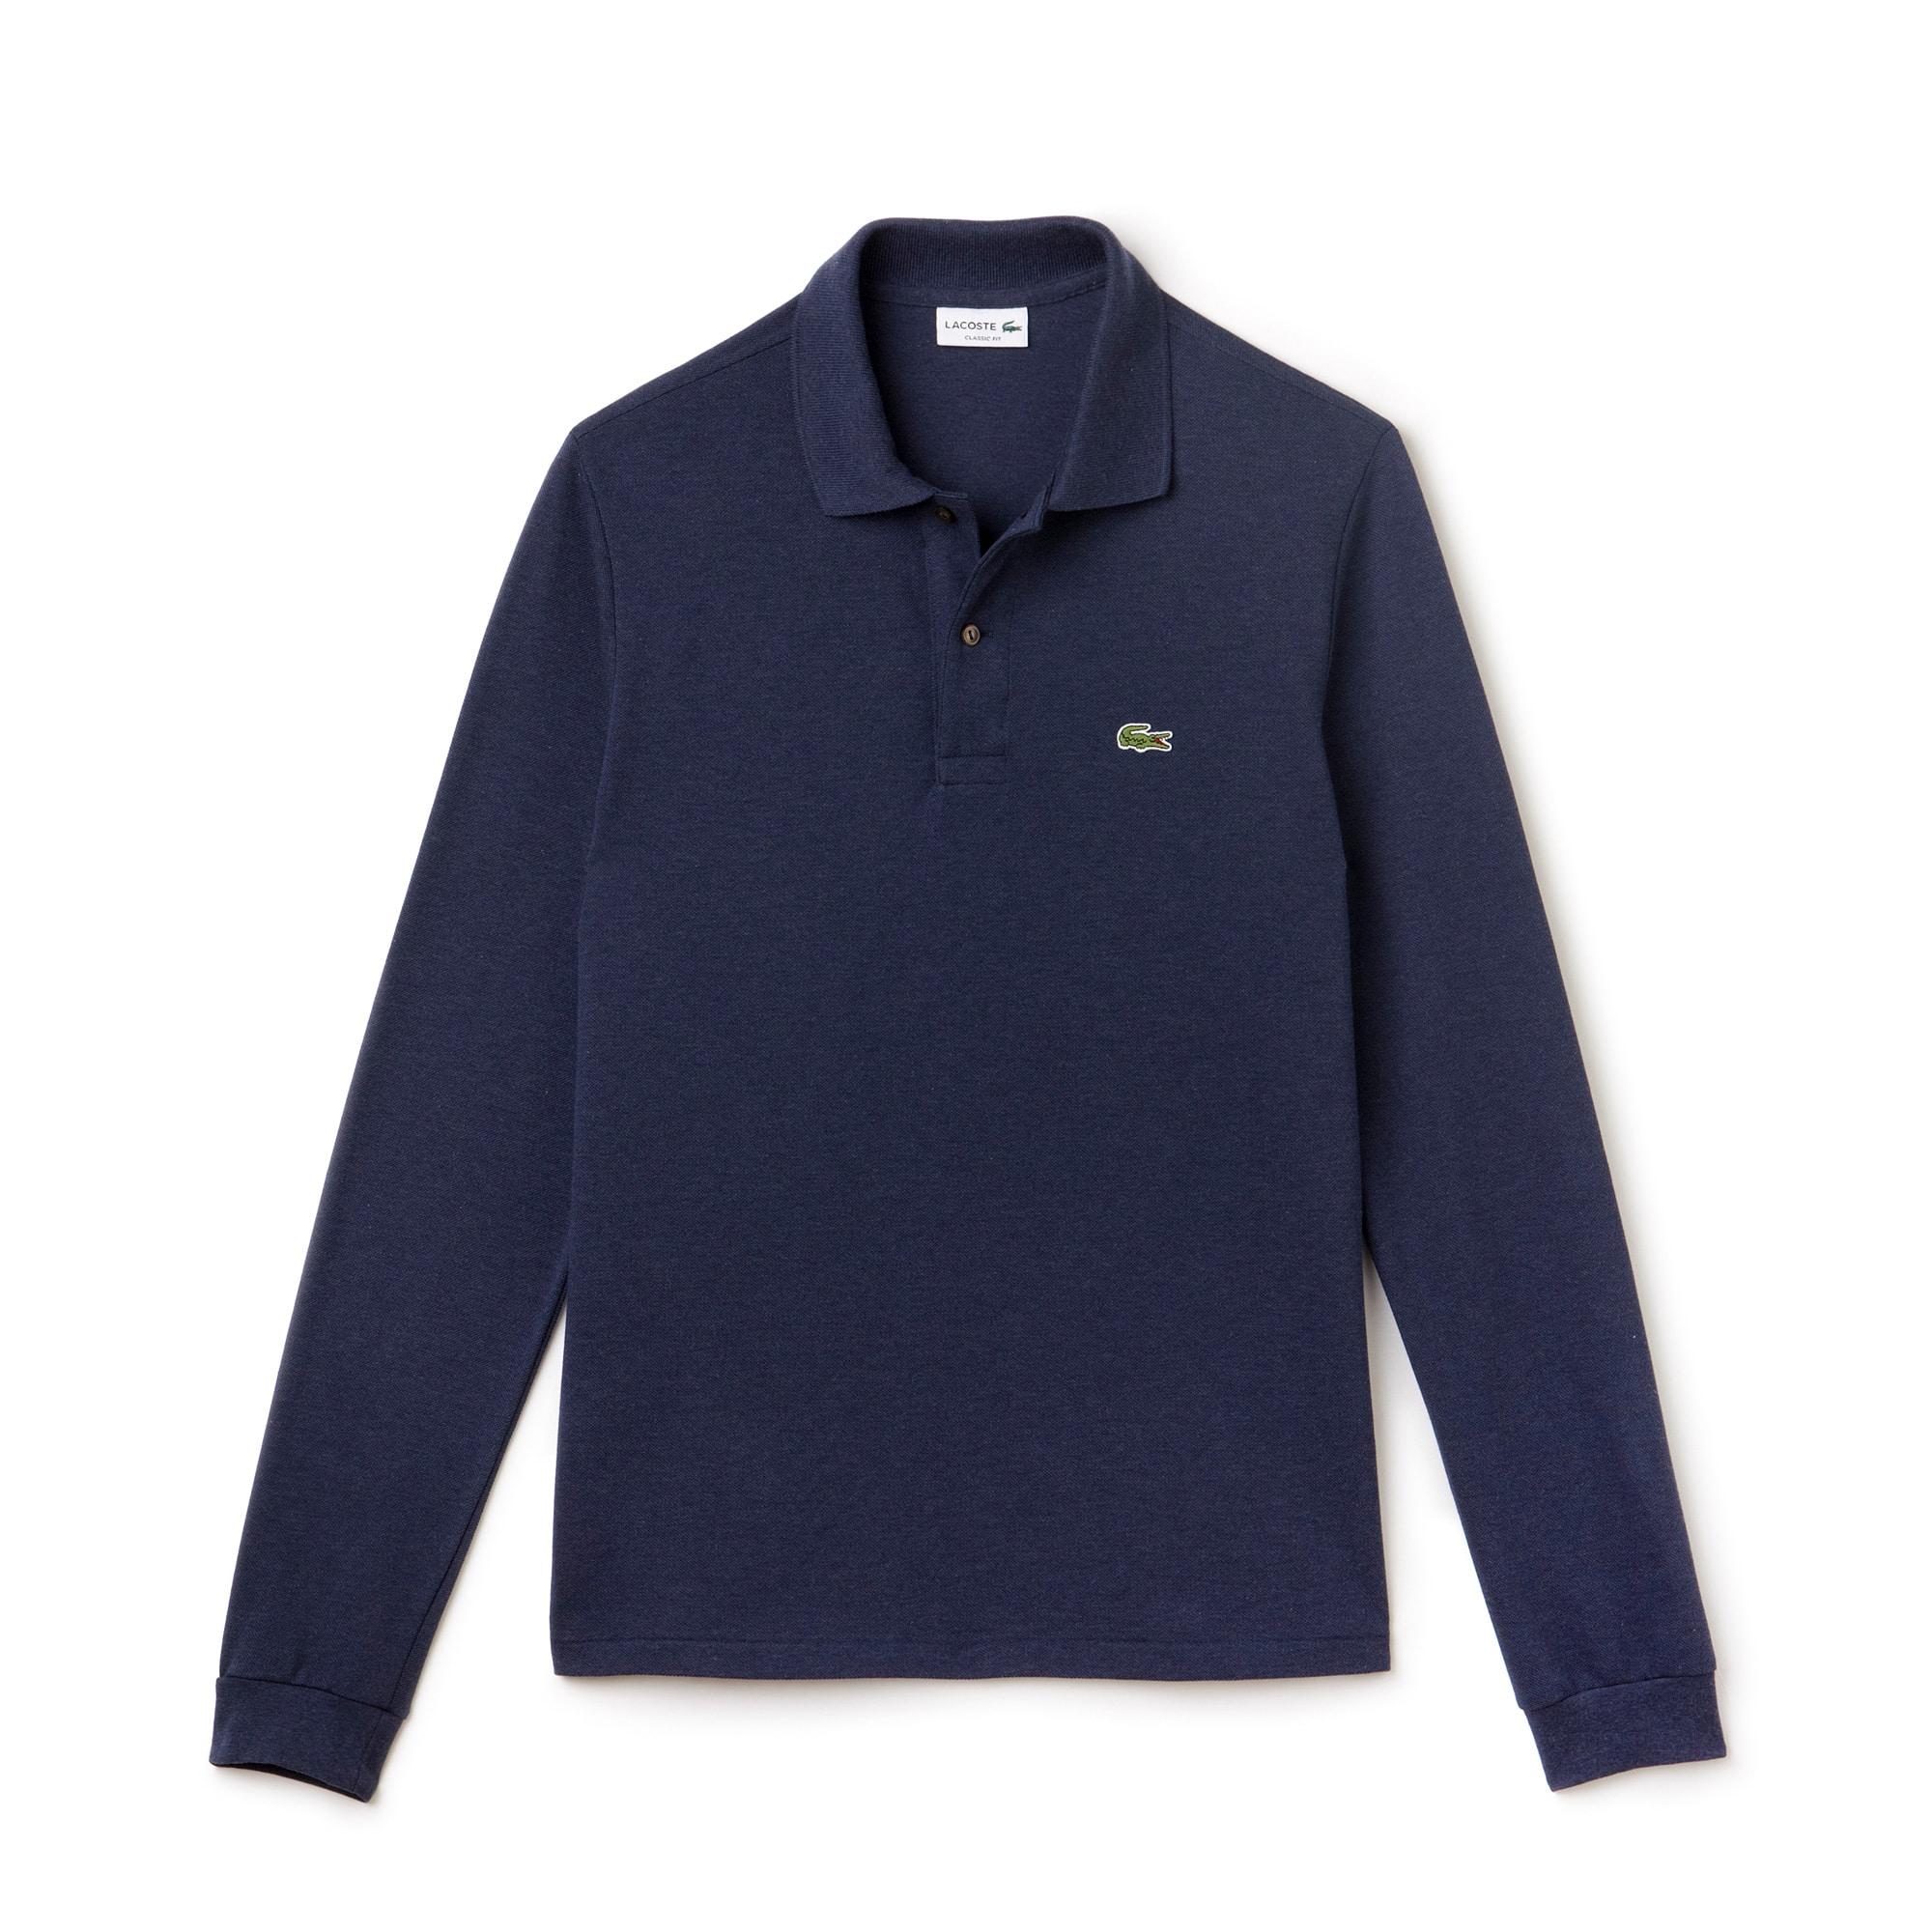 Polo Lacoste classic fit in petit piqué chiné a maniche lunghe